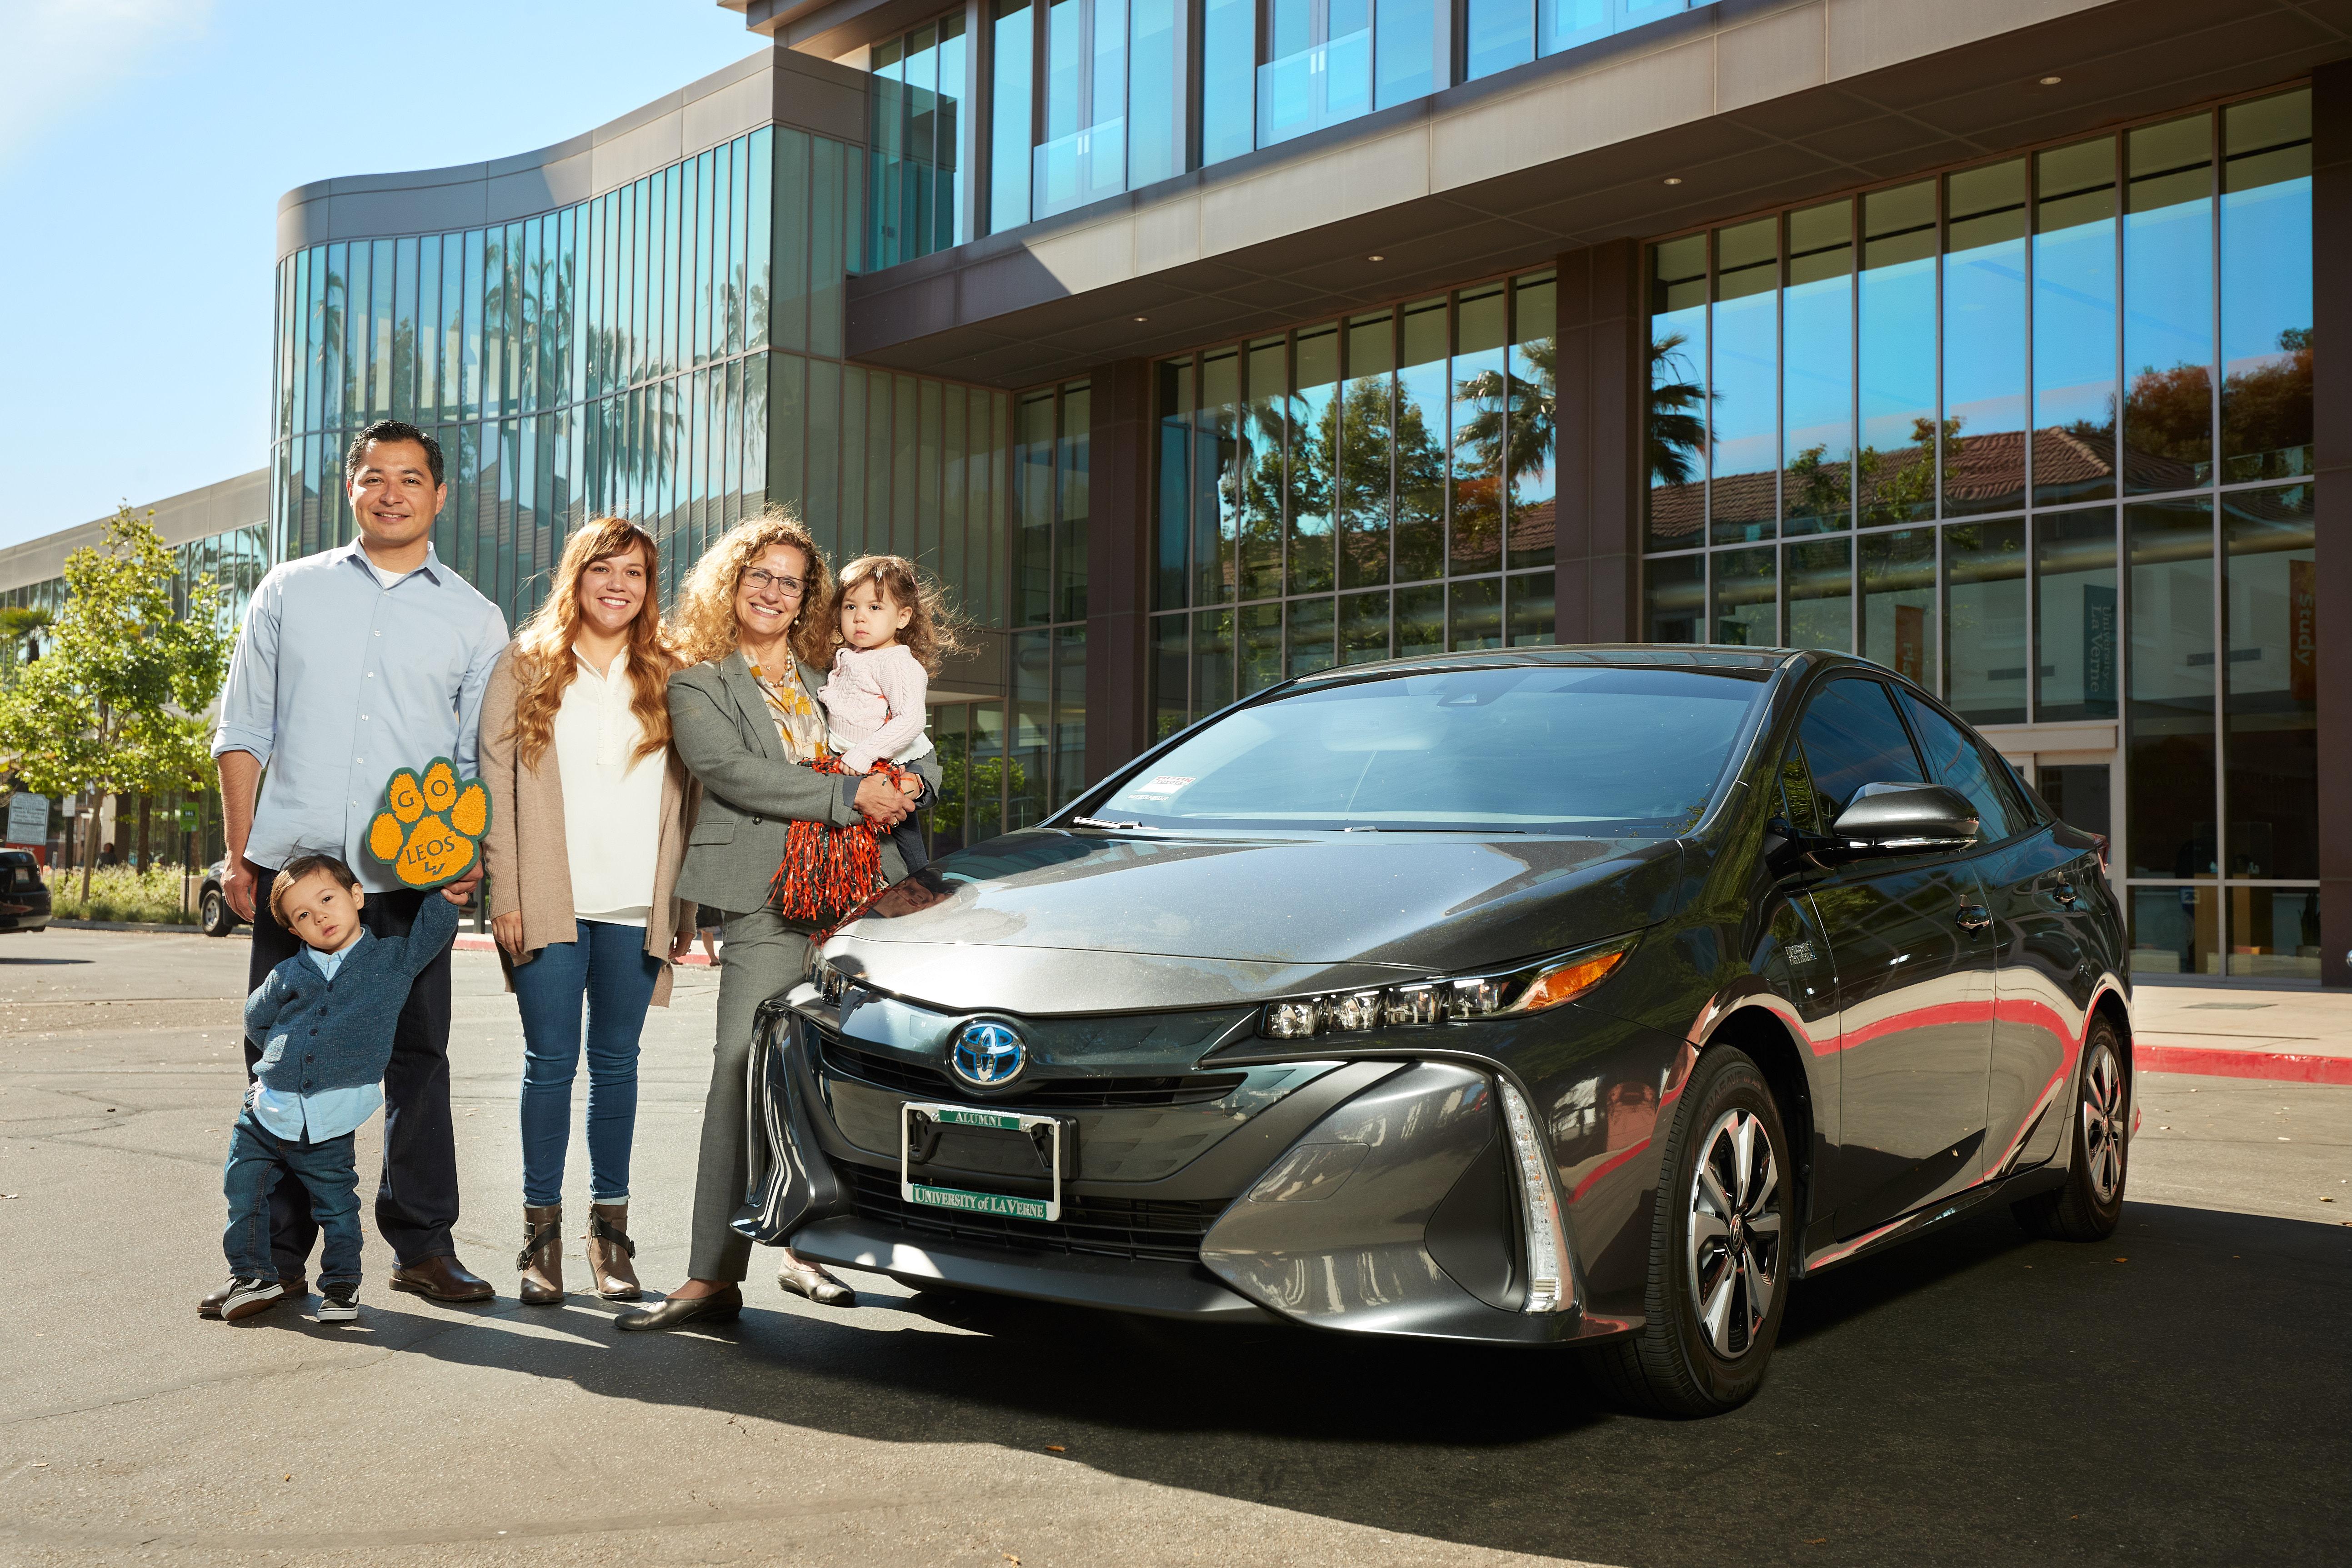 Scholarship fundraiser raffle winner poses with new Toyota Prius